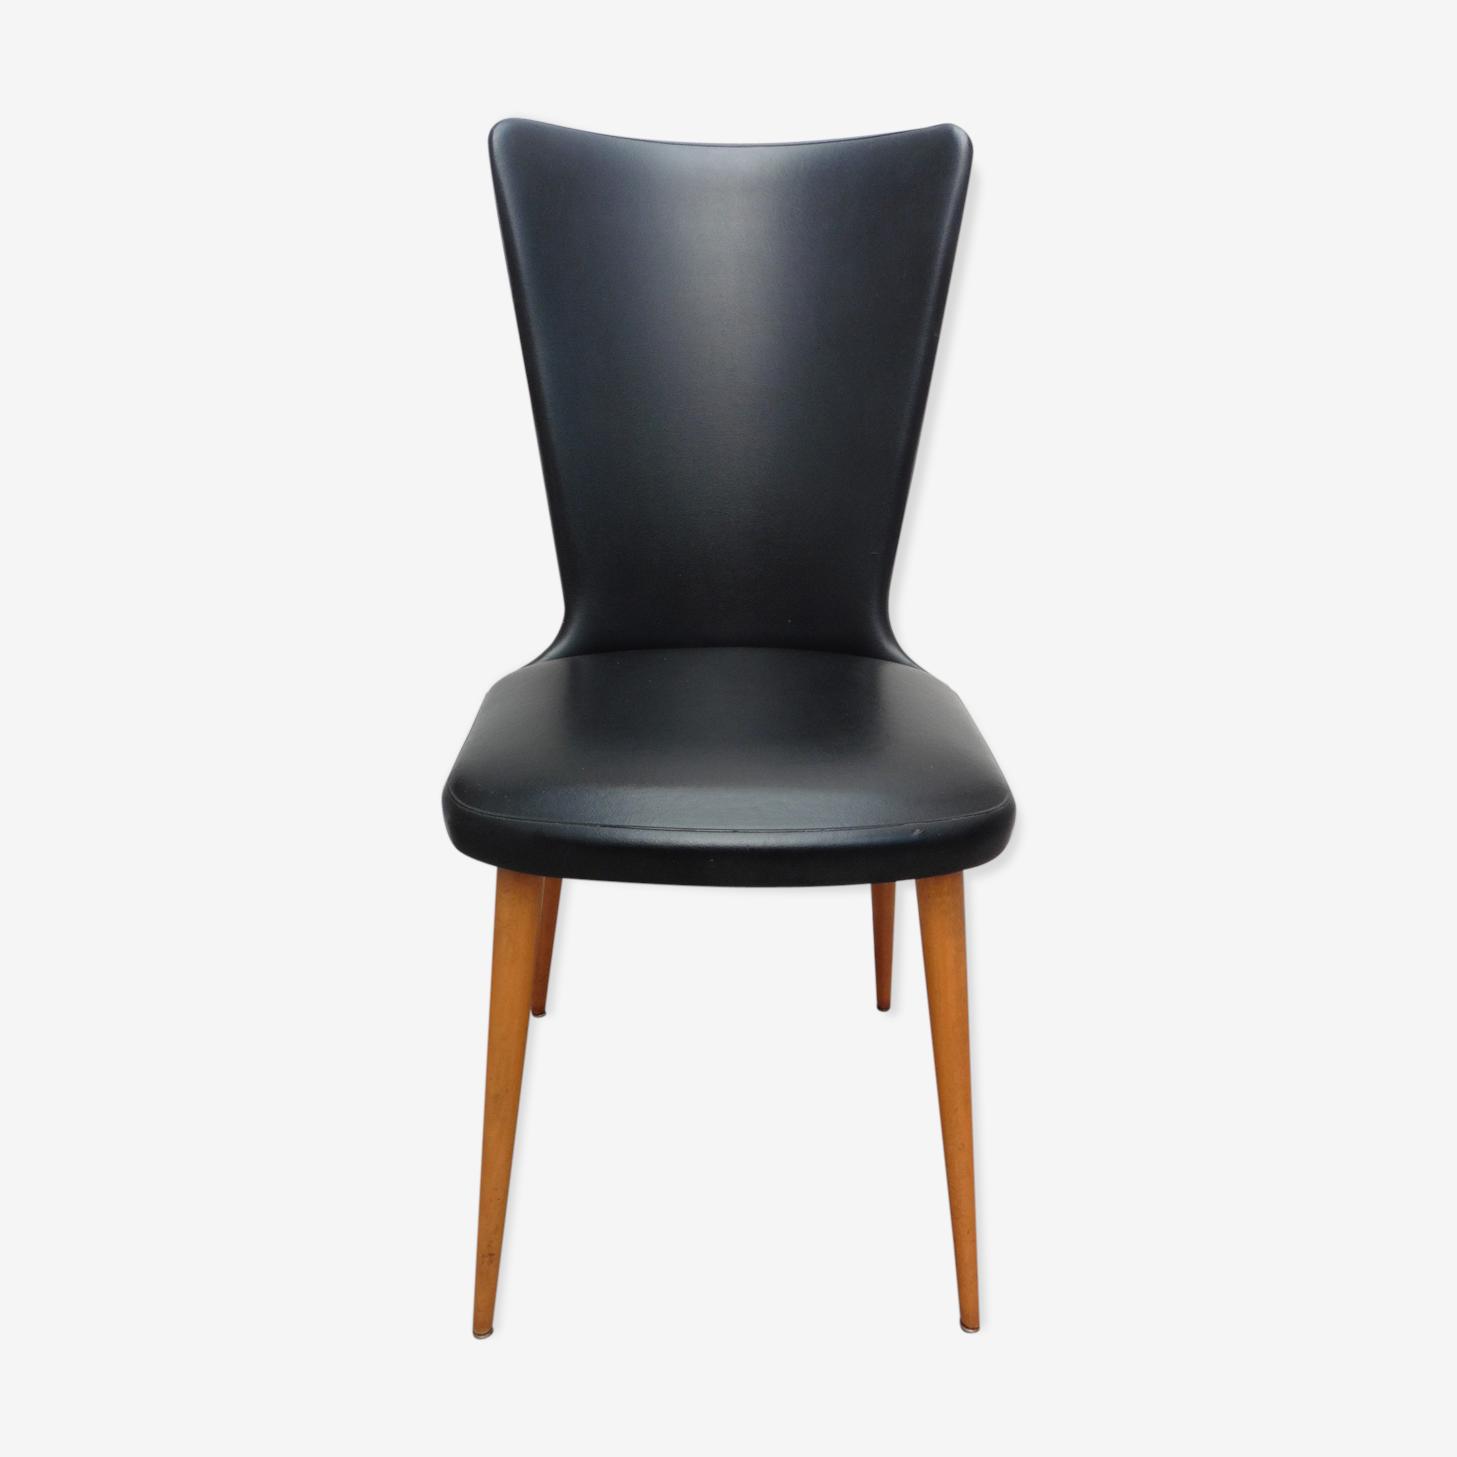 Chair black leatherette